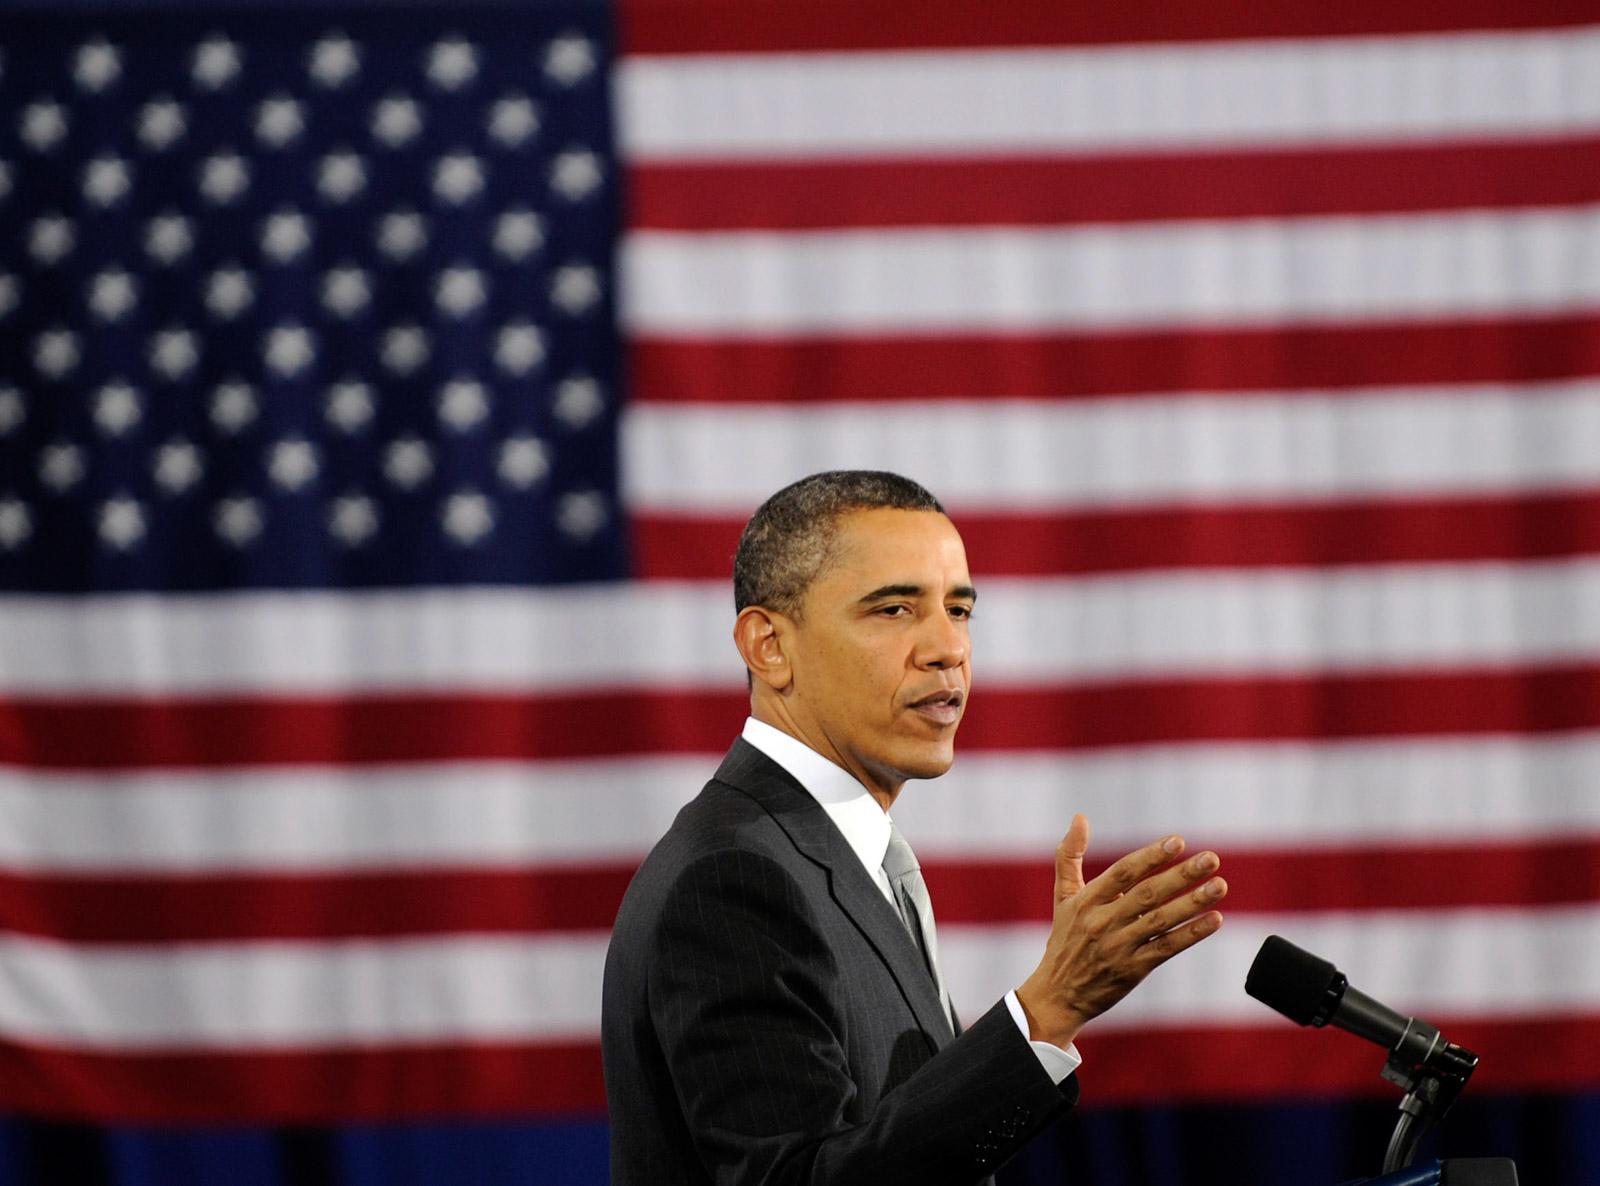 obama flag LK photos